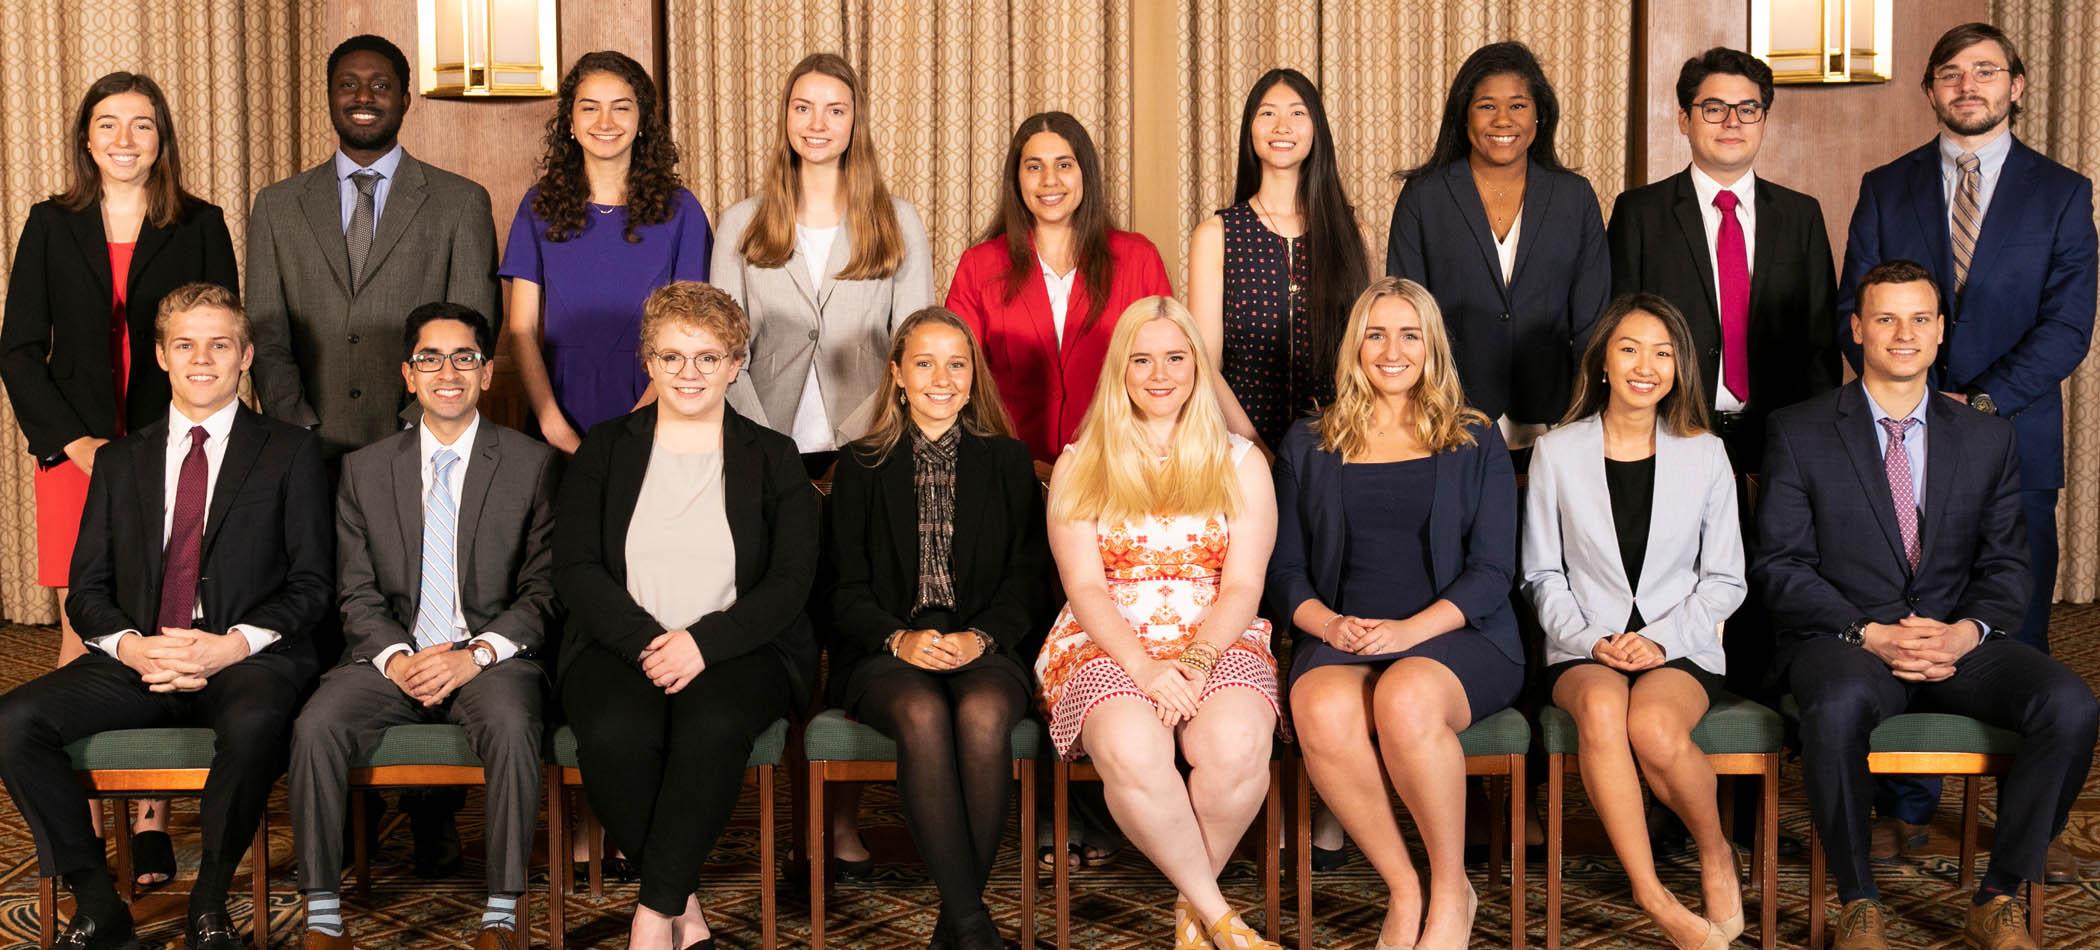 Phillips Ambassadors Spring 2019